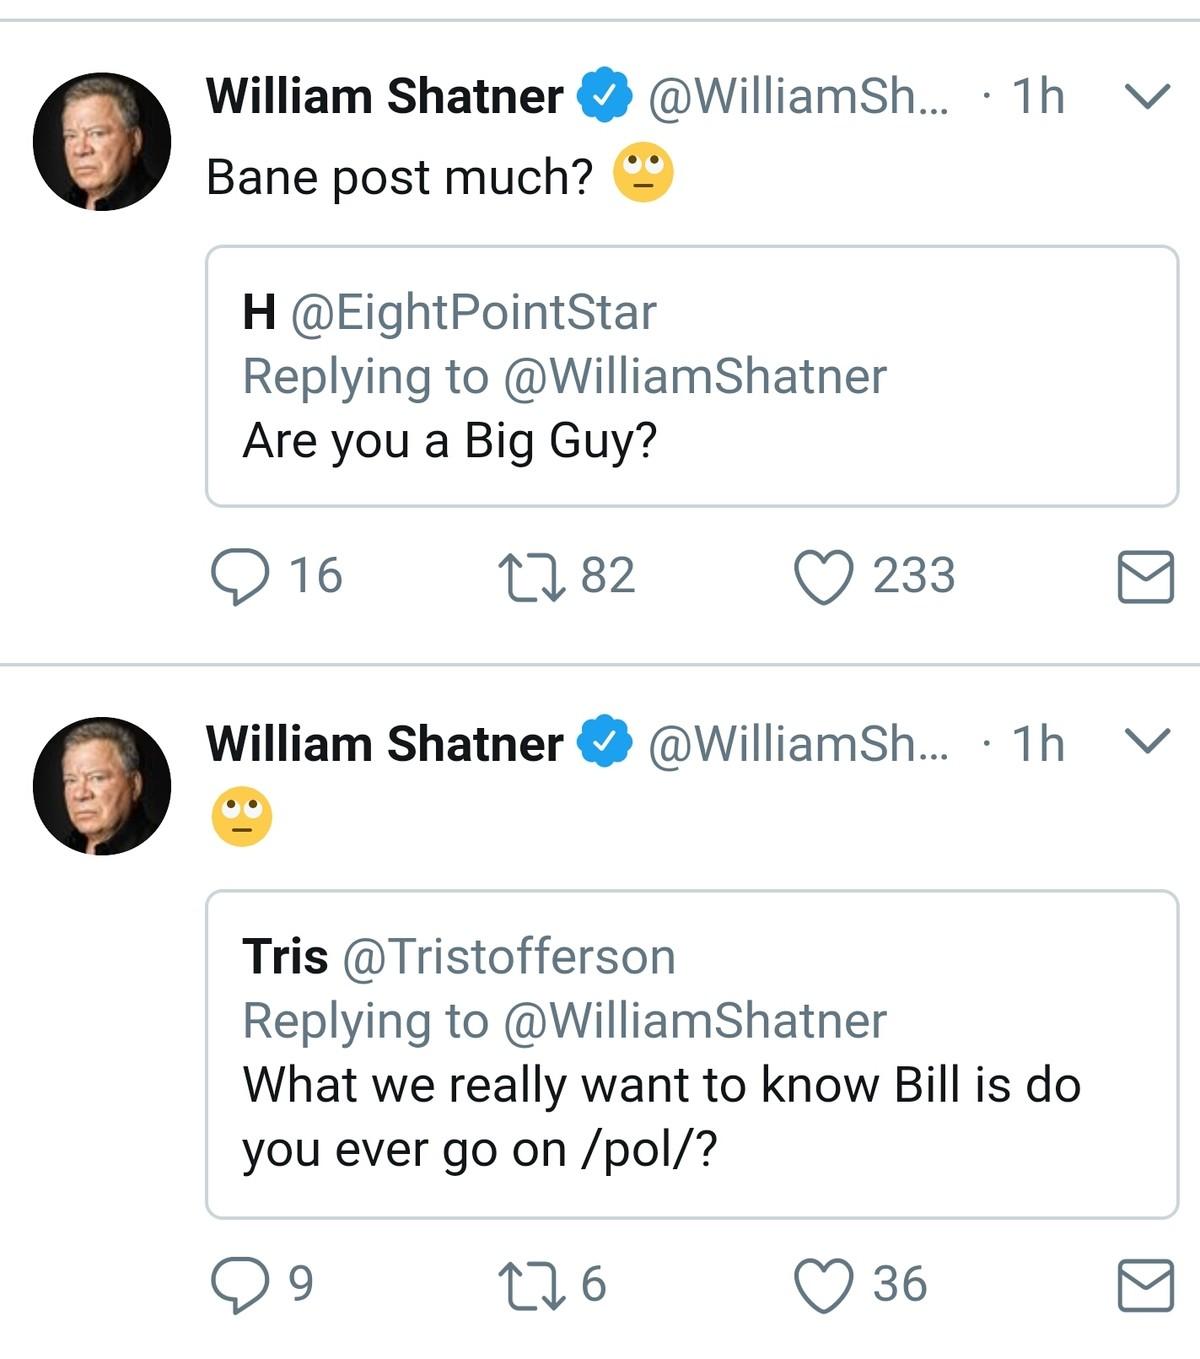 Shatner goes on 4chan?. . 6 William shatners@ ... . v Bane post much? L' Repl Shatner goes on 4chan? 6 William shatners@ v Bane post much? L' Repl